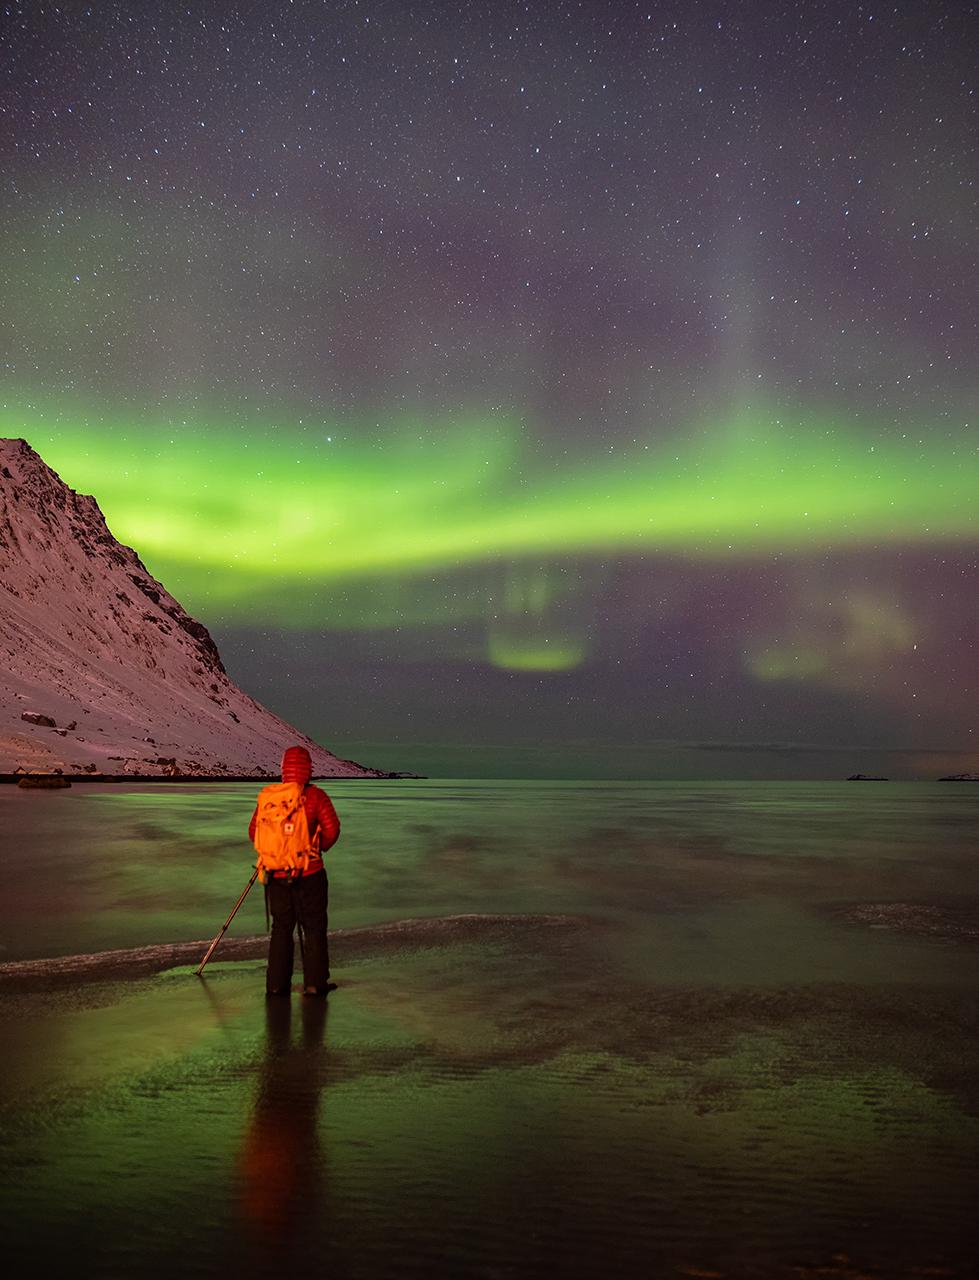 33Open_Pete_Scifres_1_Lights_Baby_Green_Lights